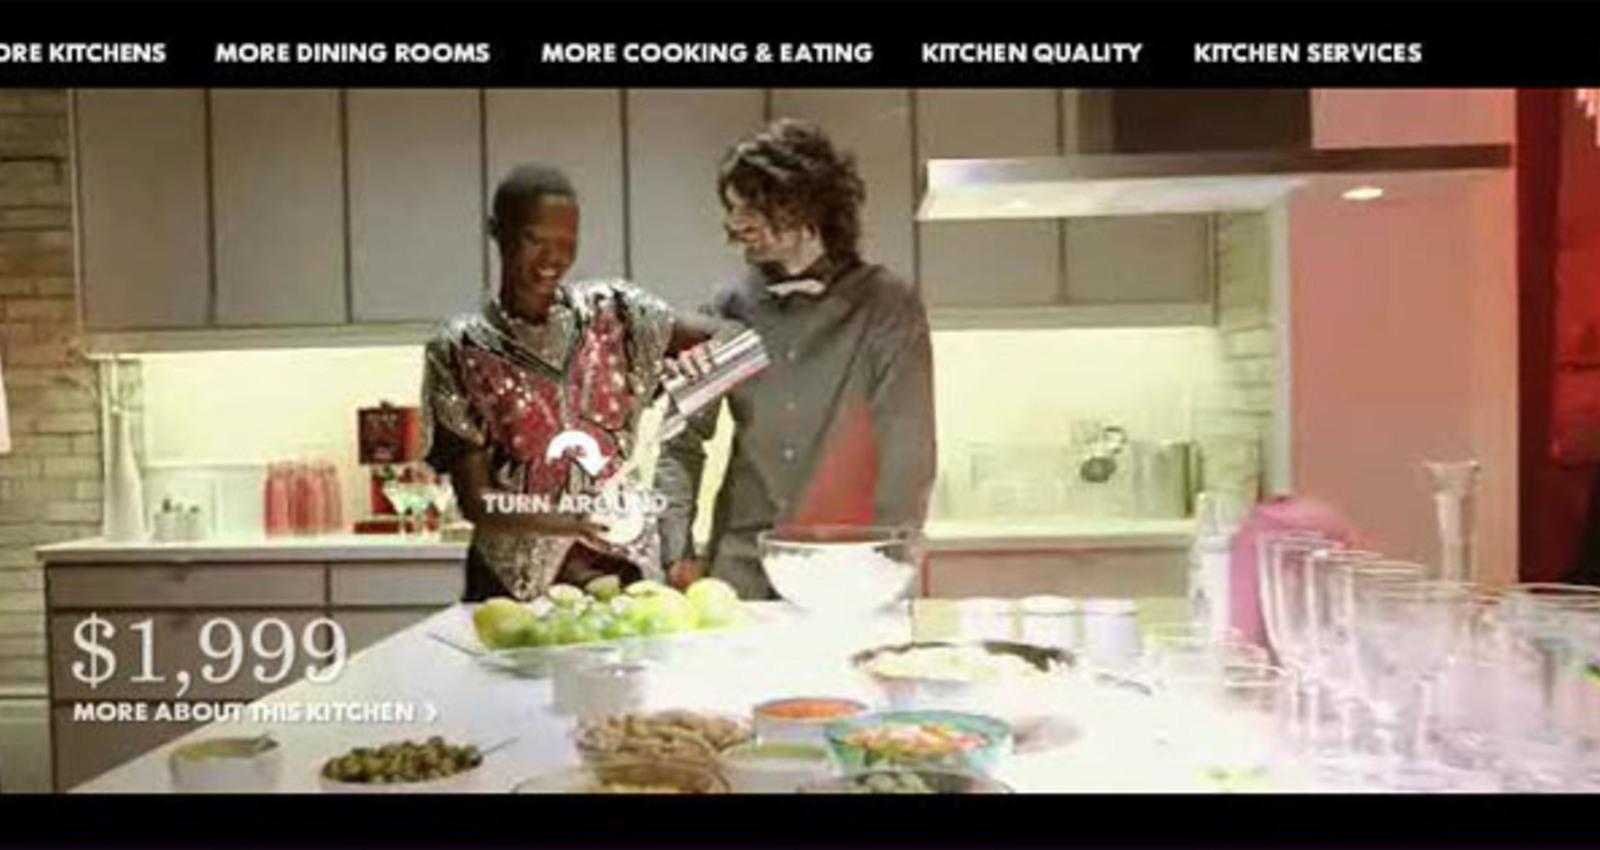 Around the world in five kitchens